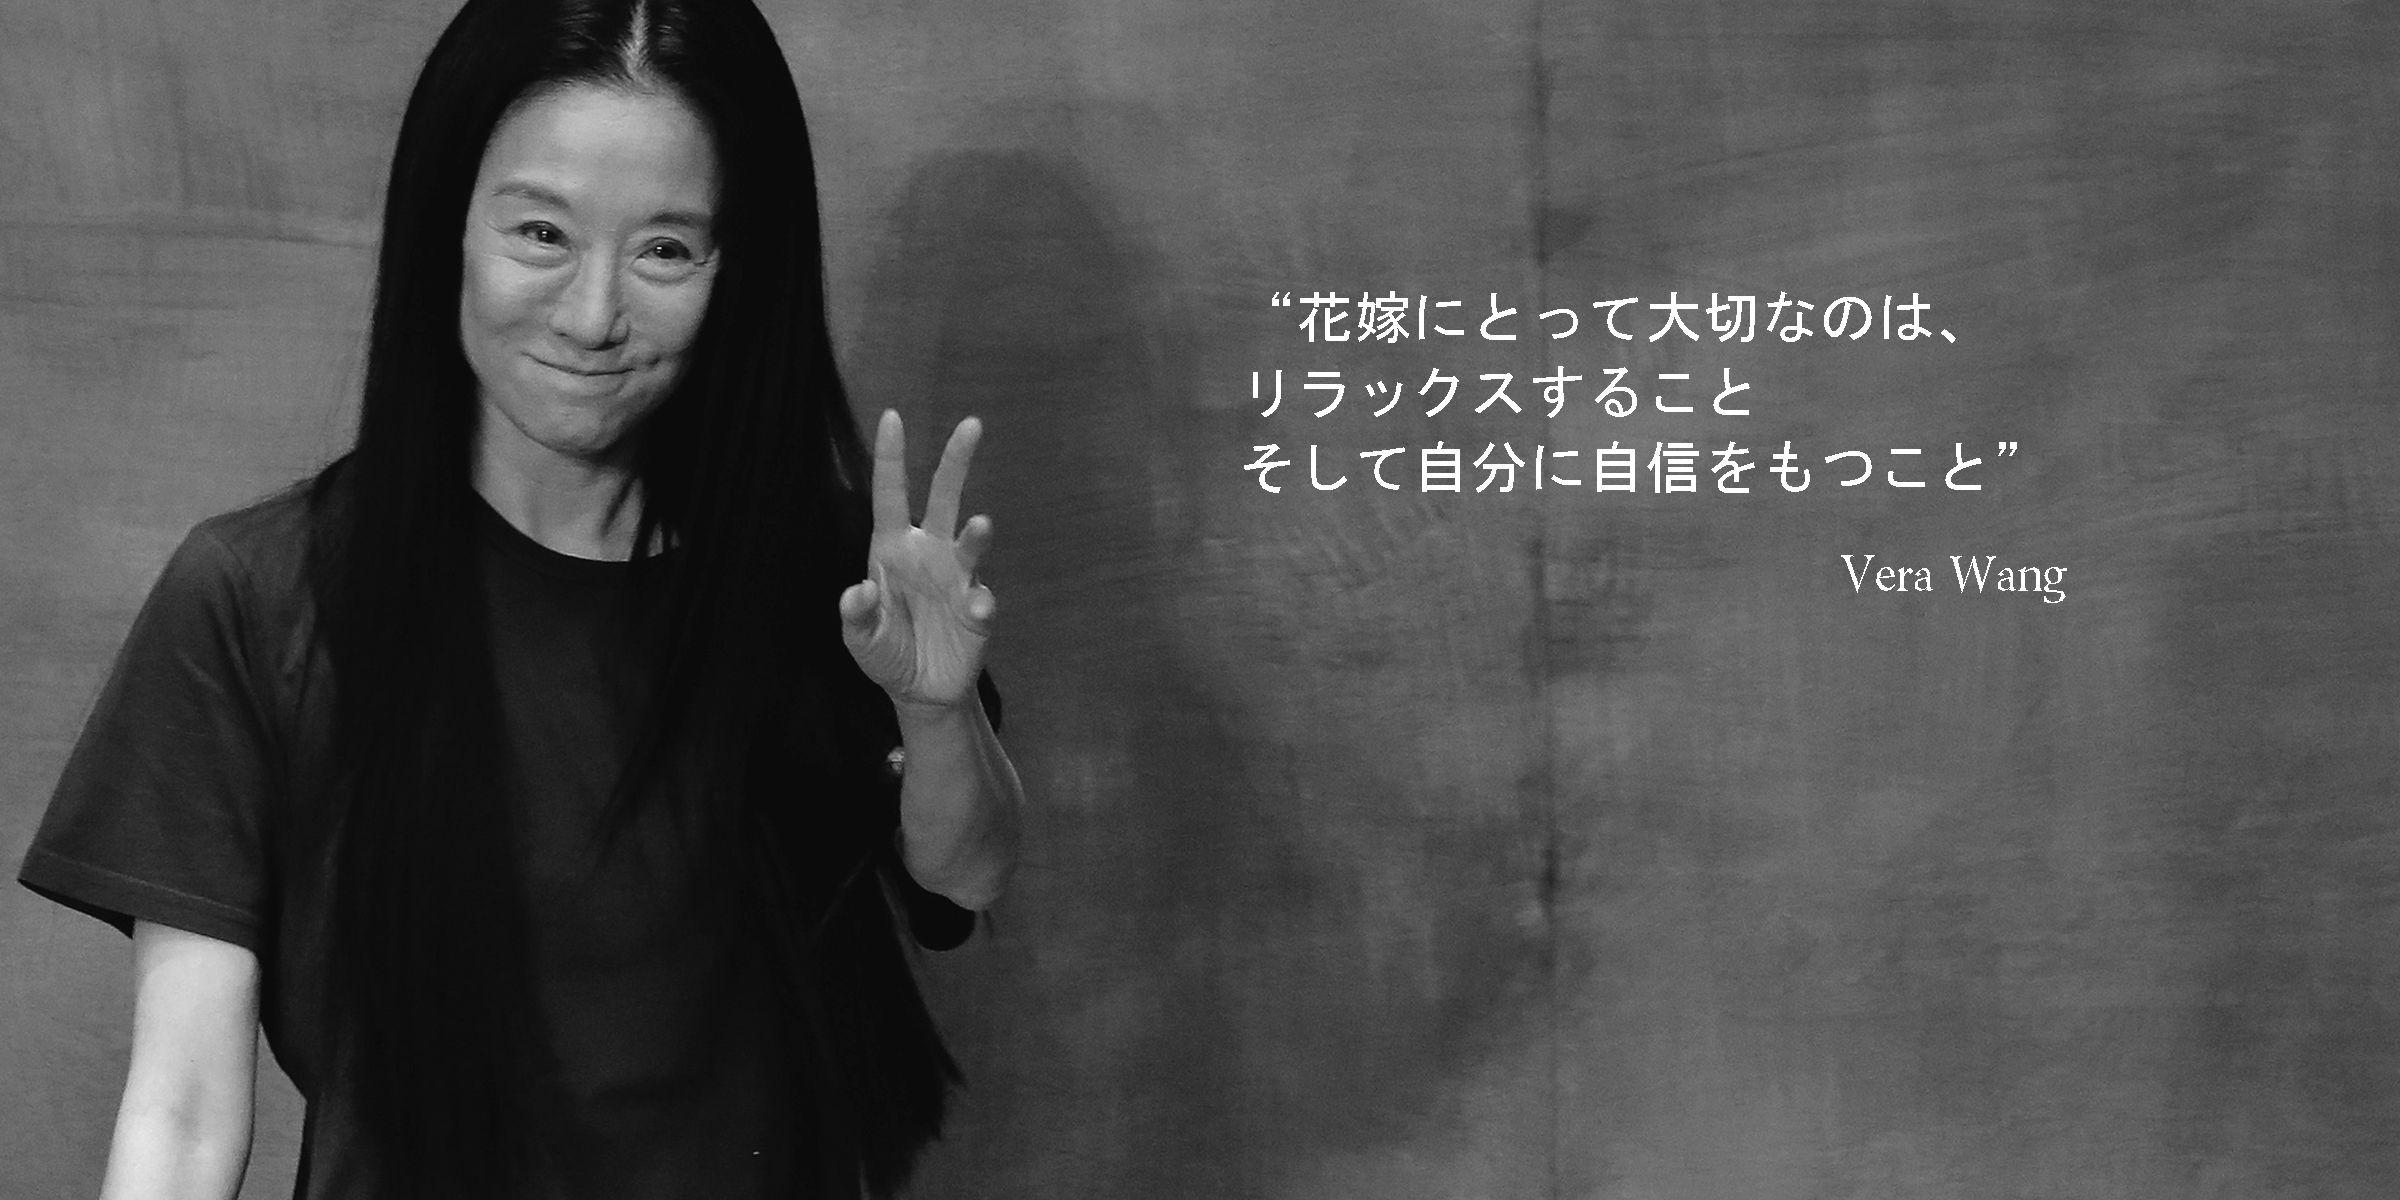 a1772d15bd671 世界的な人気ドレスブランド「ヴェラ・ウォン」にまつわる26の小ネタ集 ...